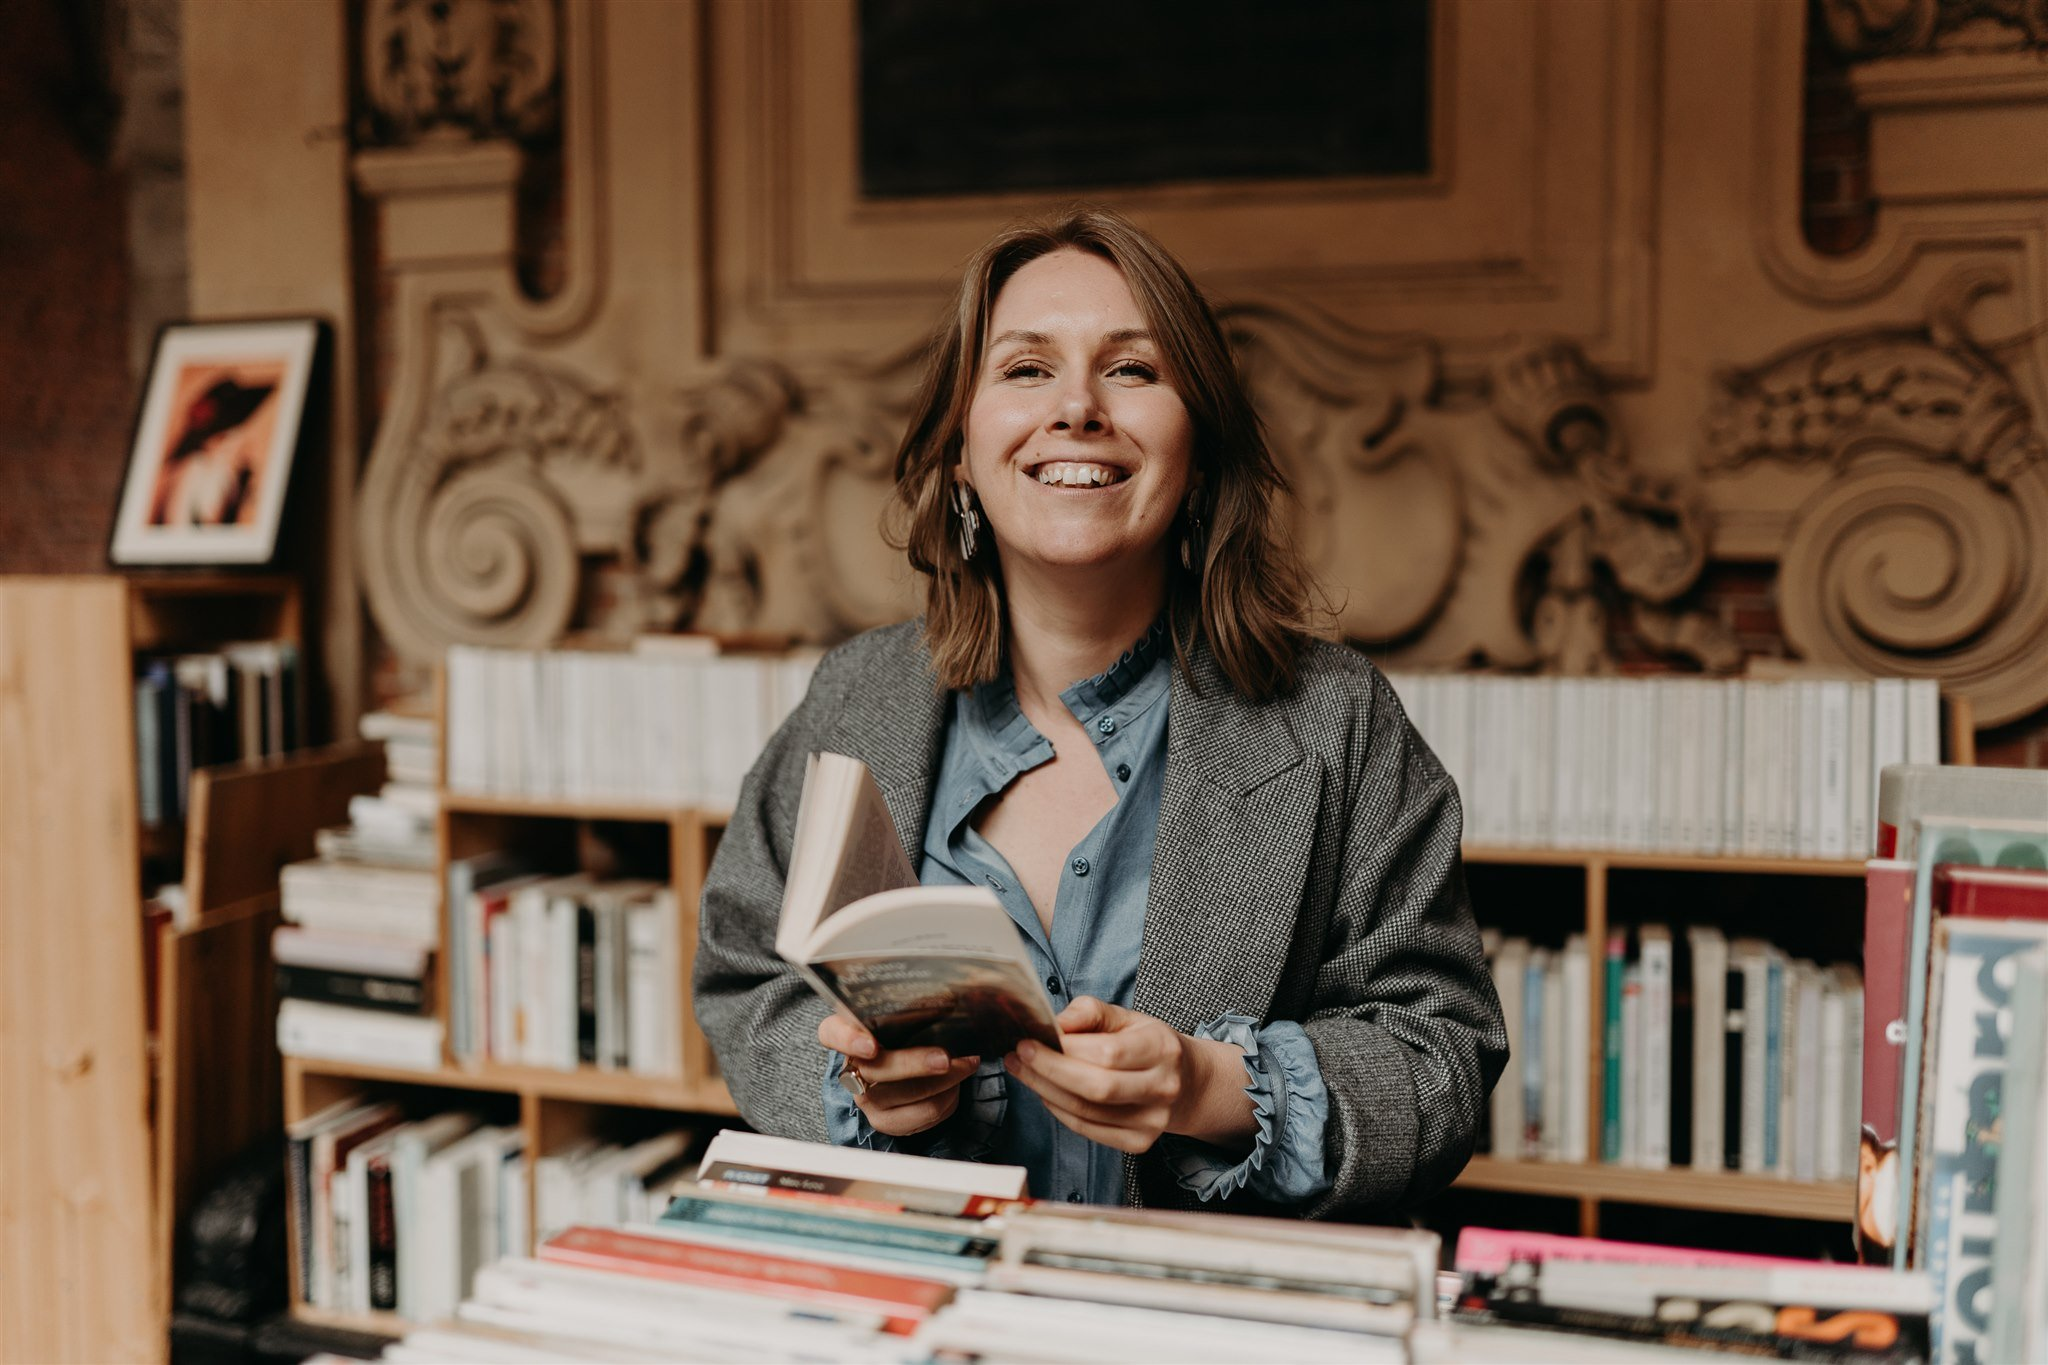 ekaterina-hoarau-at-bookstore